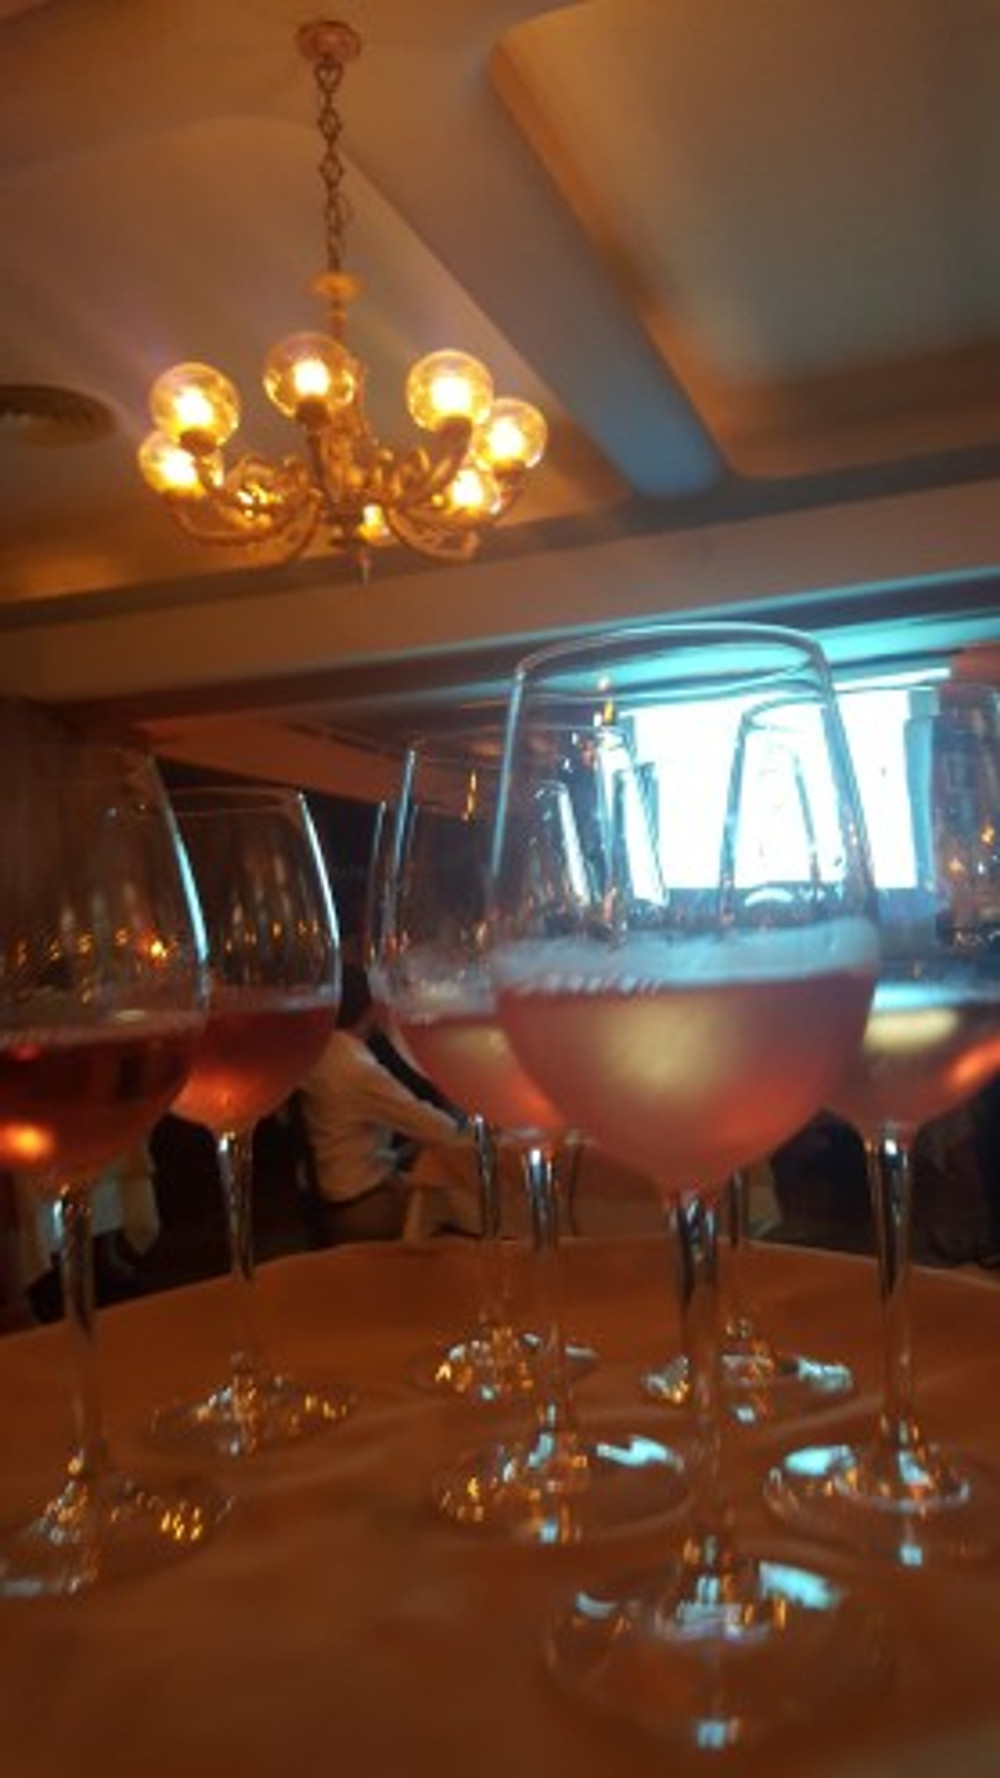 crisstilben cris pelomundo lidio carraro vinho olimpíadas vinhos (15)